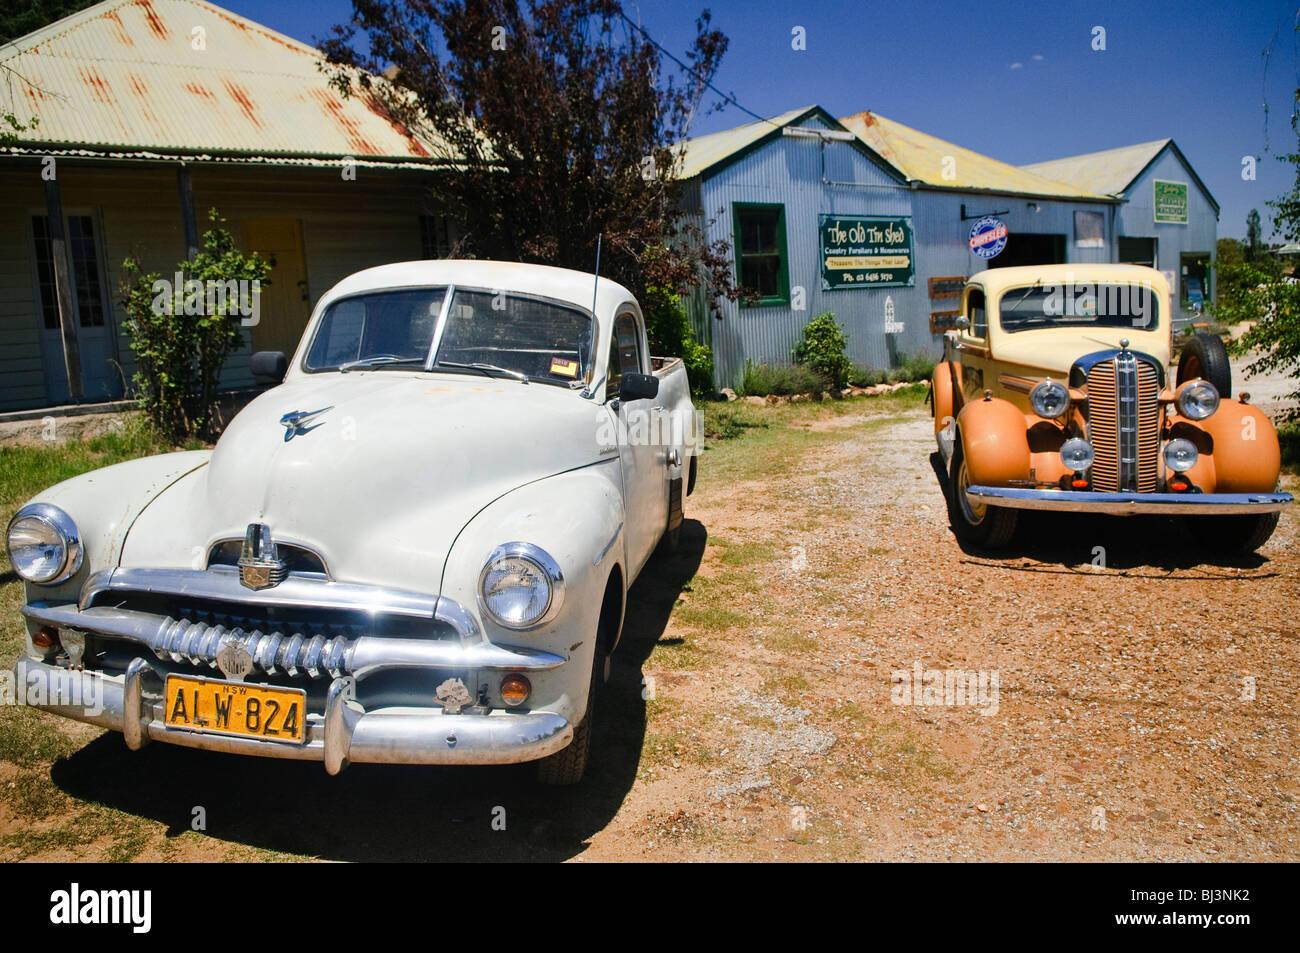 Holden Ute Stock Photos & Holden Ute Stock Images - Alamy